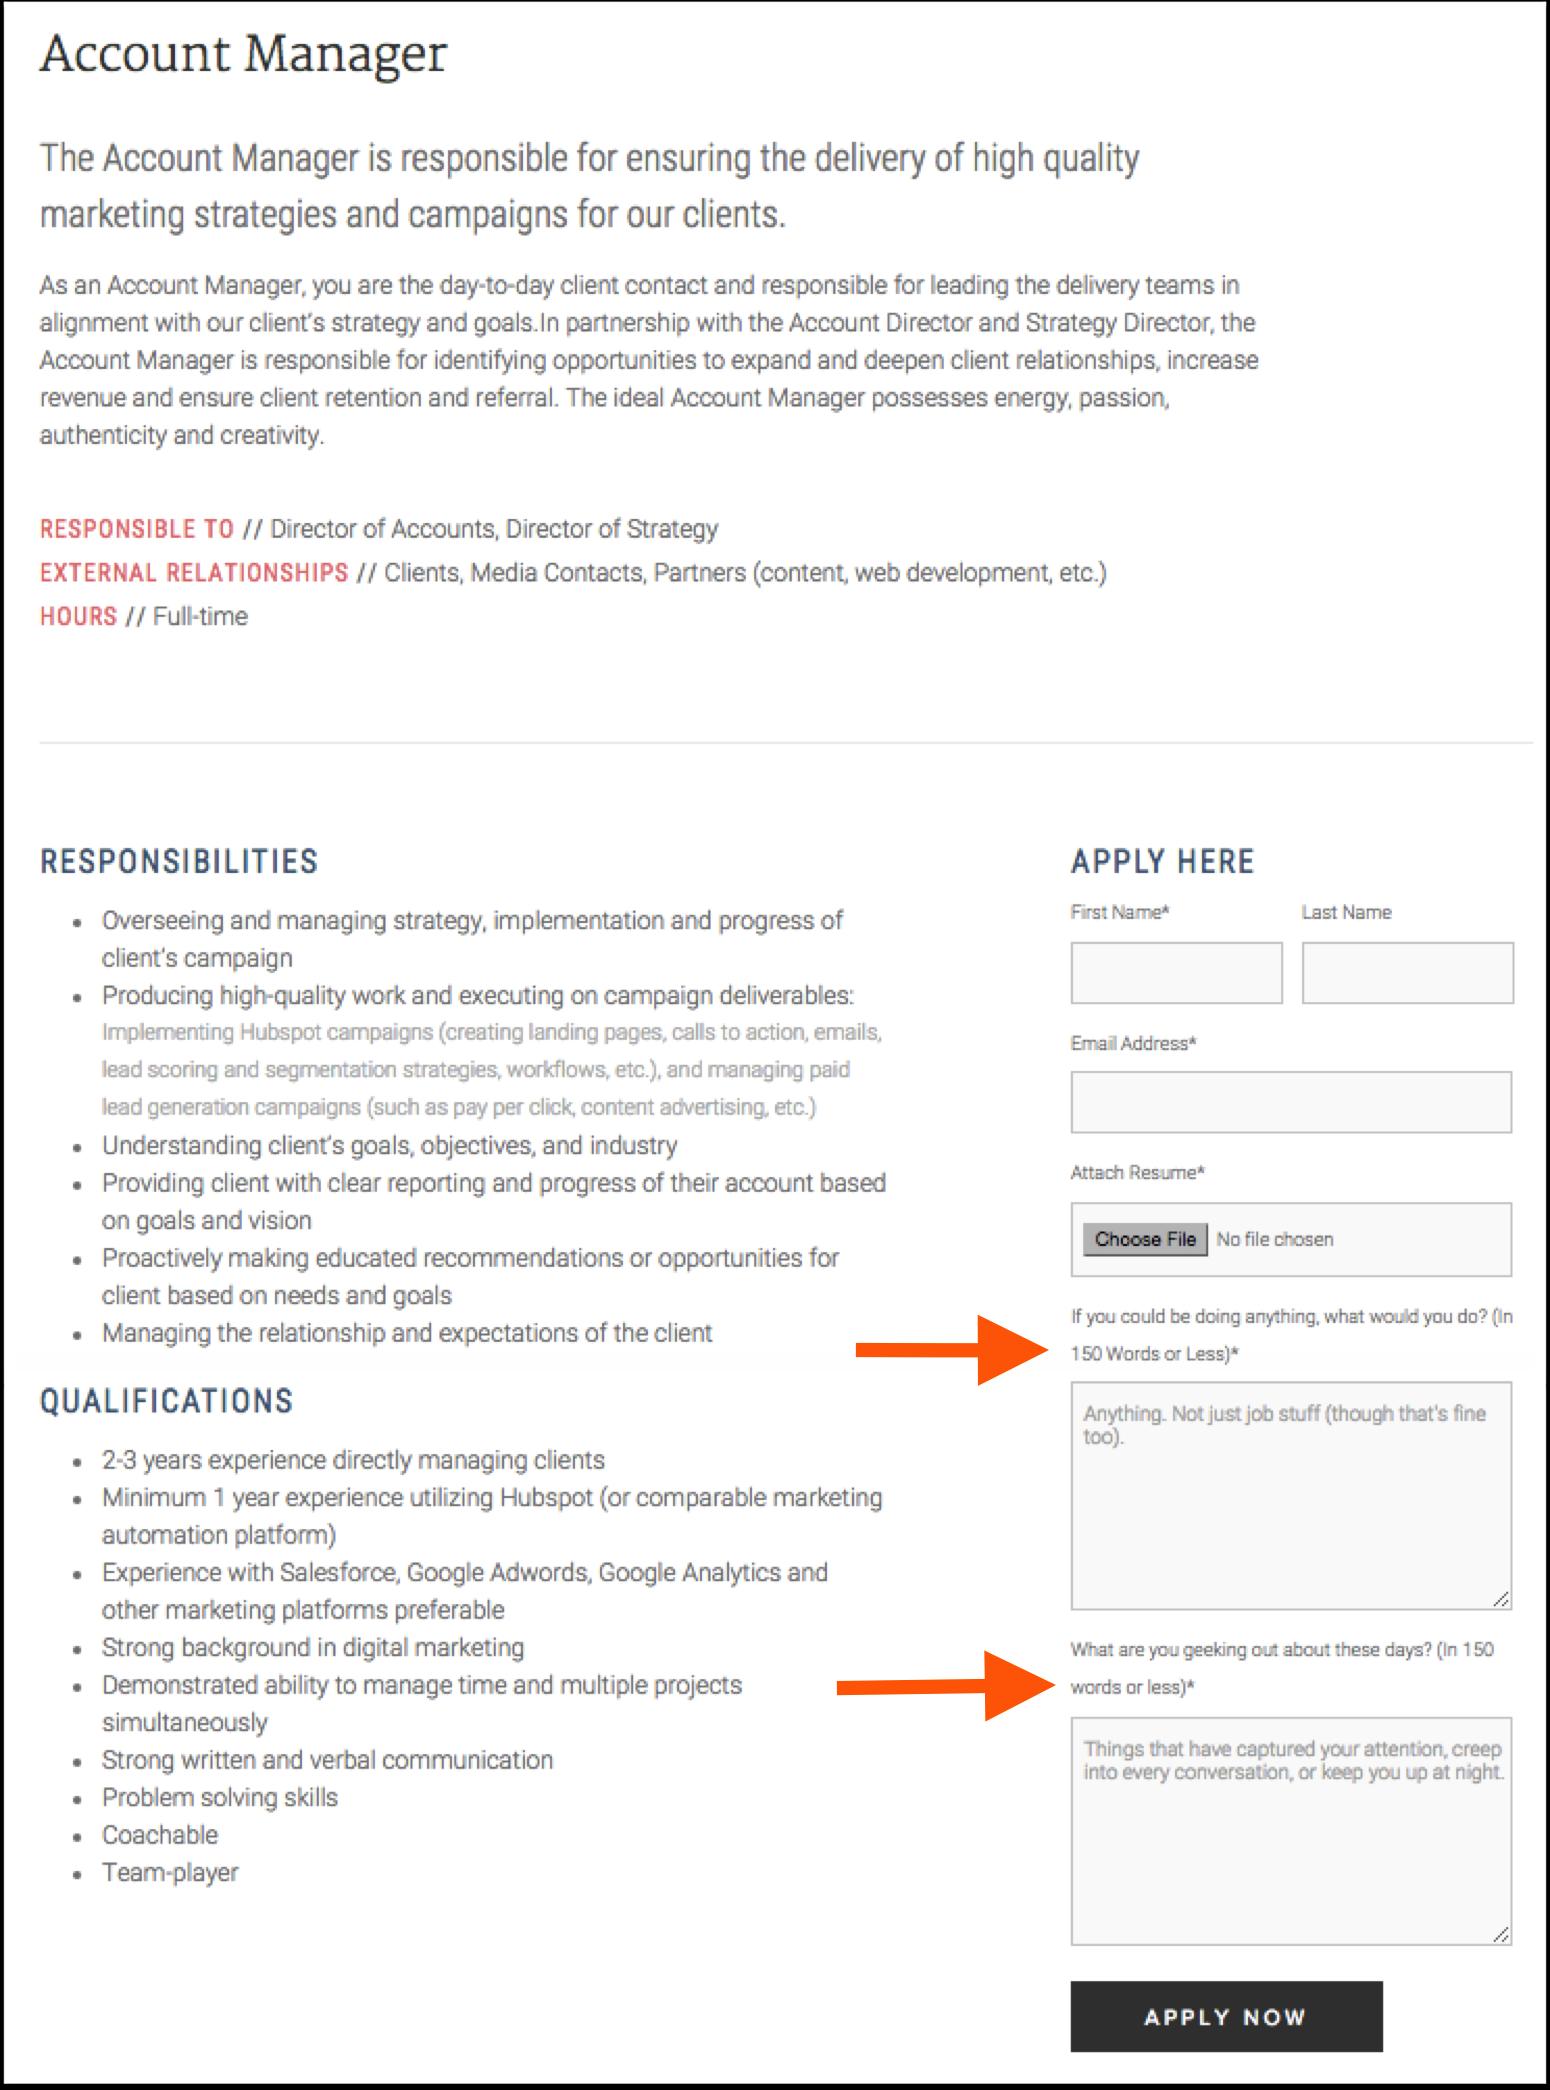 PCR_Agency_Job_Application_Form.png